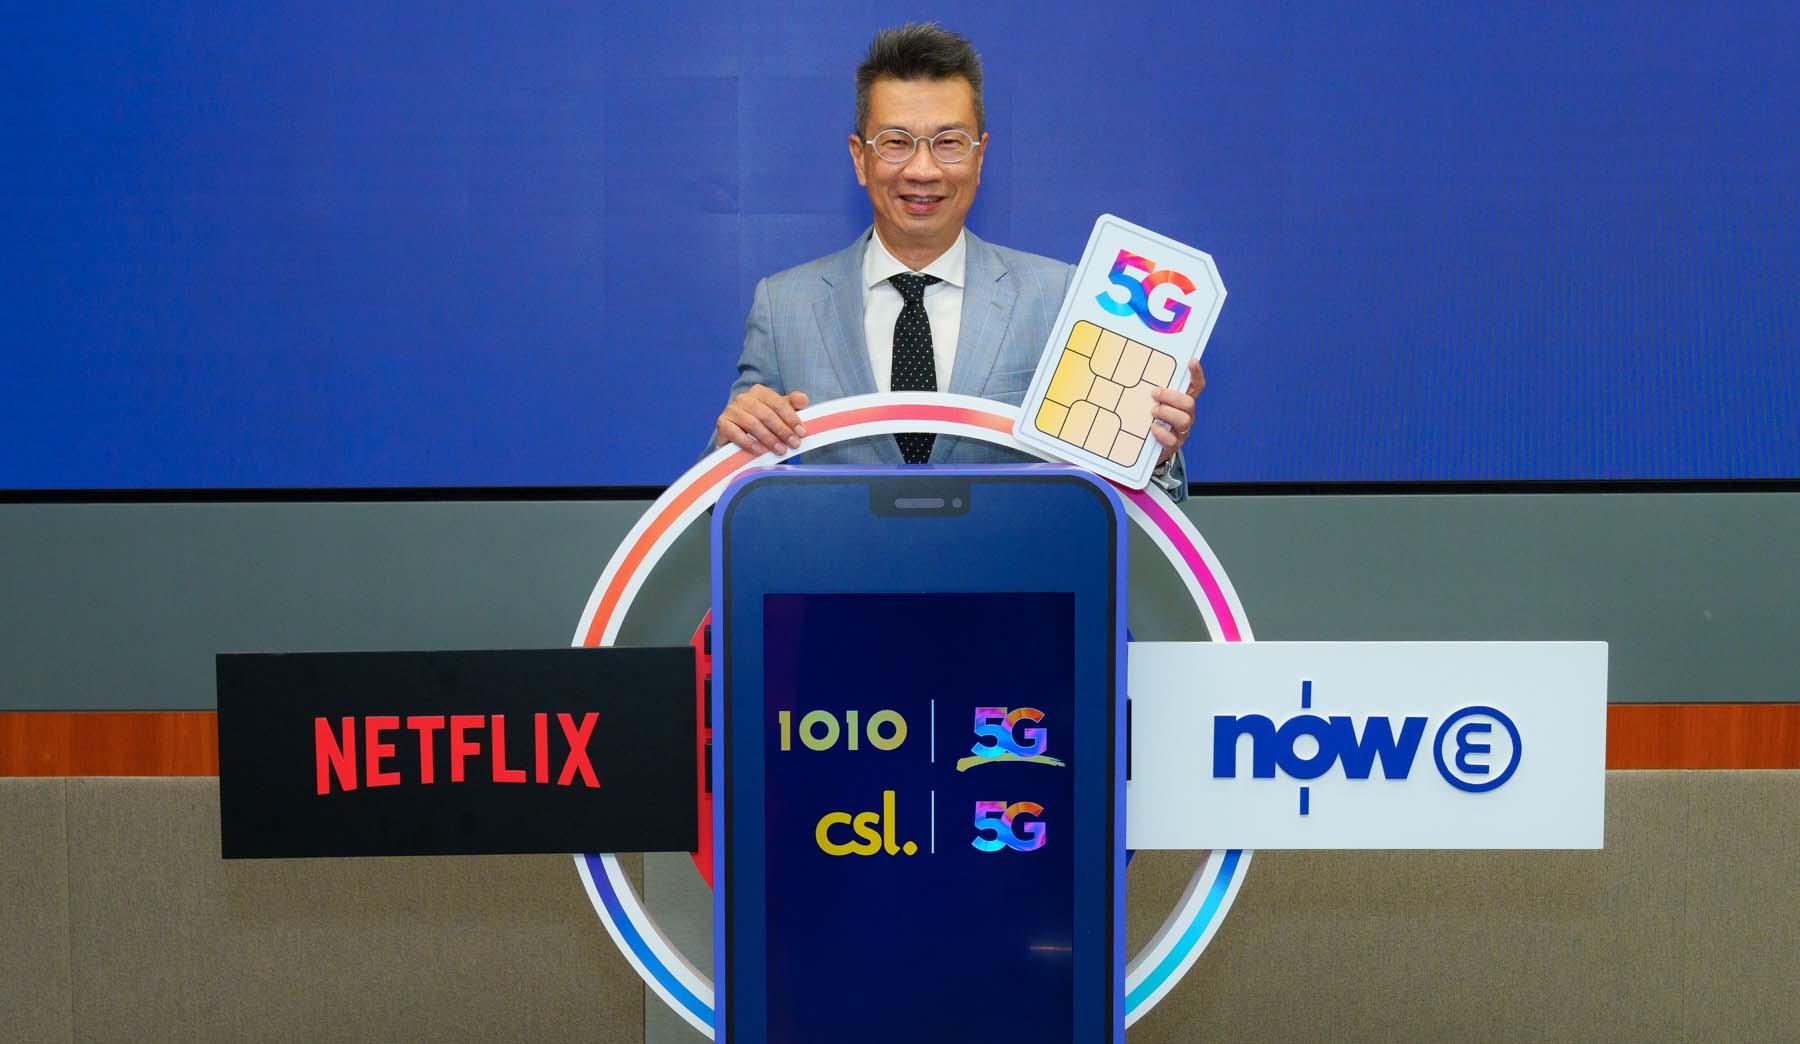 CSL Mobile 帶來獨一無二影視娛樂組合  CSL Mobile x Netflix 5G 串流煲劇